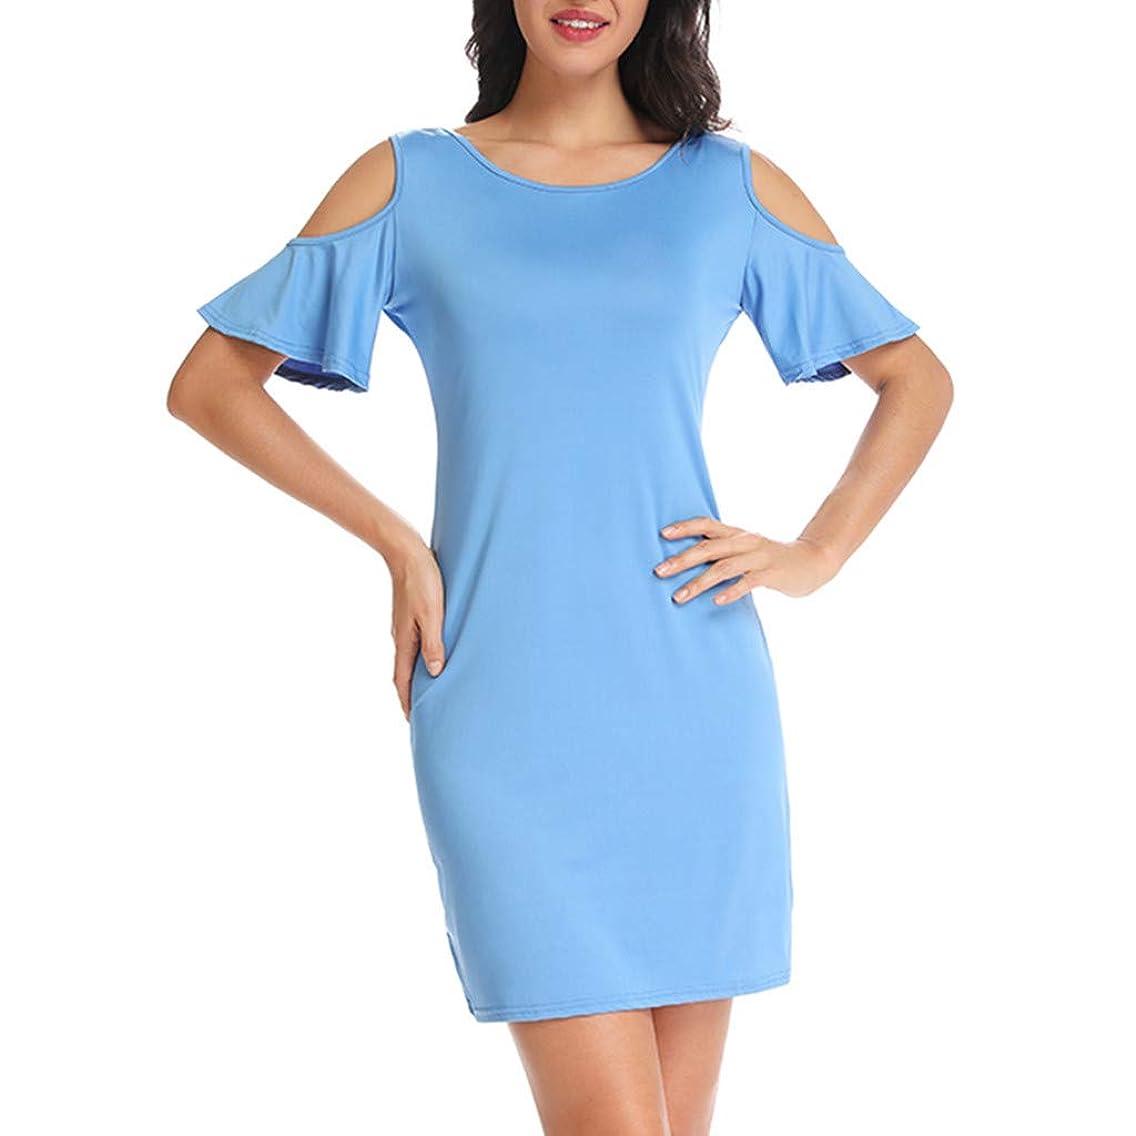 Womens Dresses for Party,E_Vicia Women's Slim Dress Casual Summer Cold Shoulder Back Lace Flower Bodycon Dress Plus Size